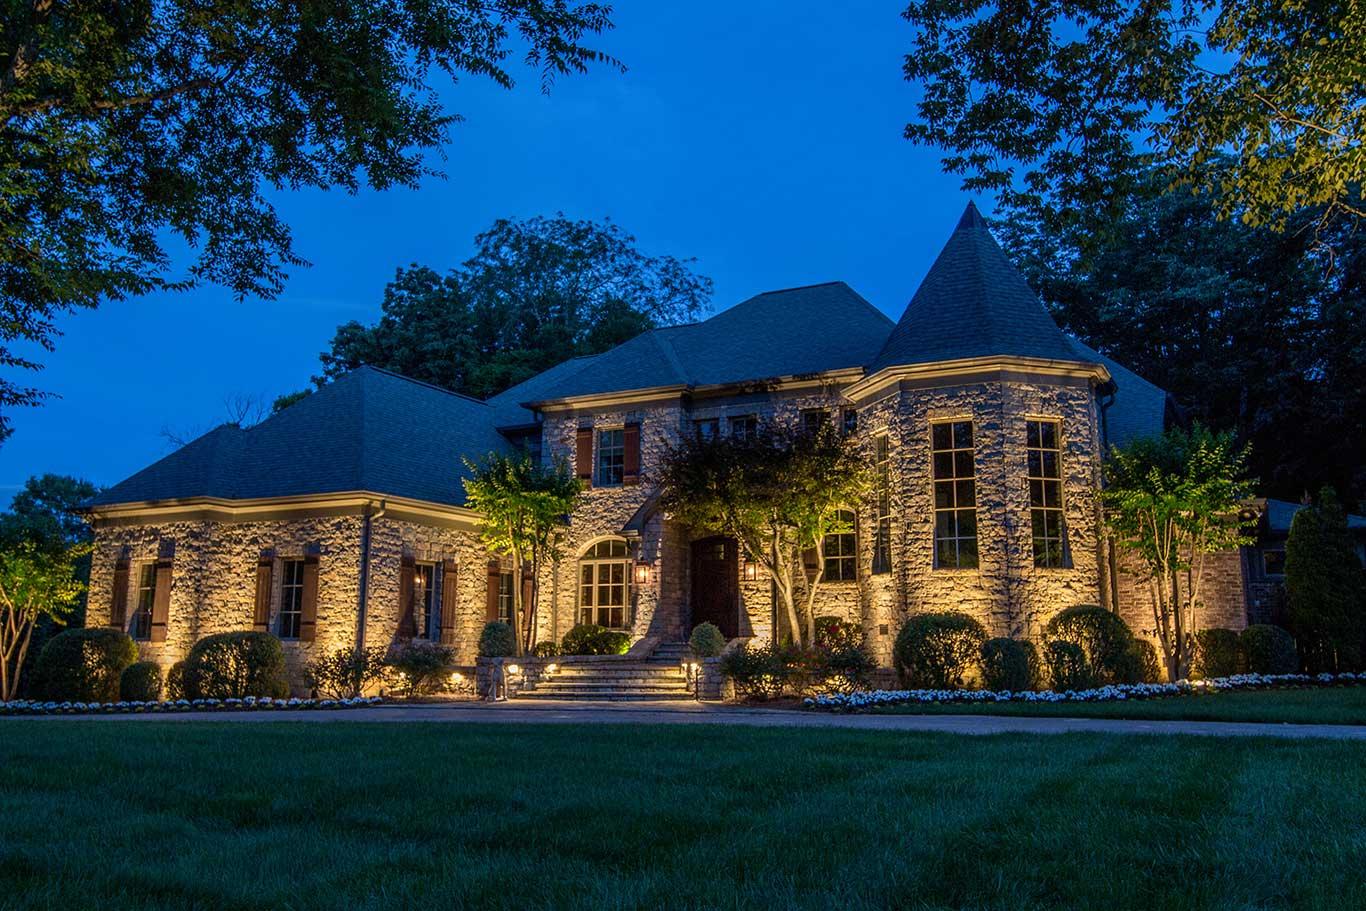 grazing-effect-up-lighting-exterior-facade.jpg